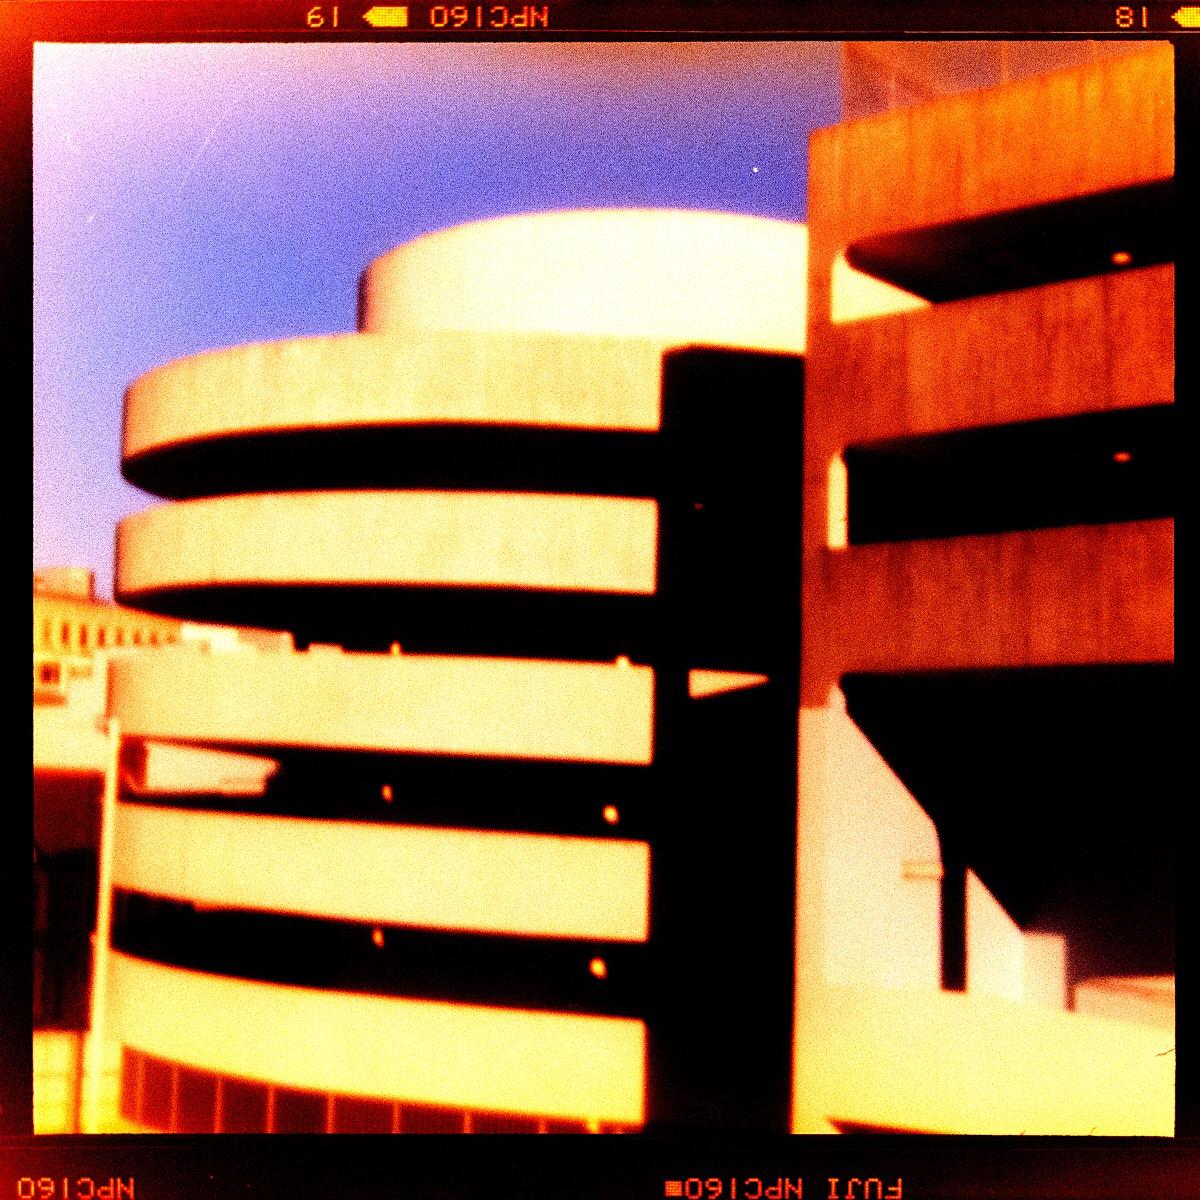 Concrete Brutalism, car park spiral in pinhole.